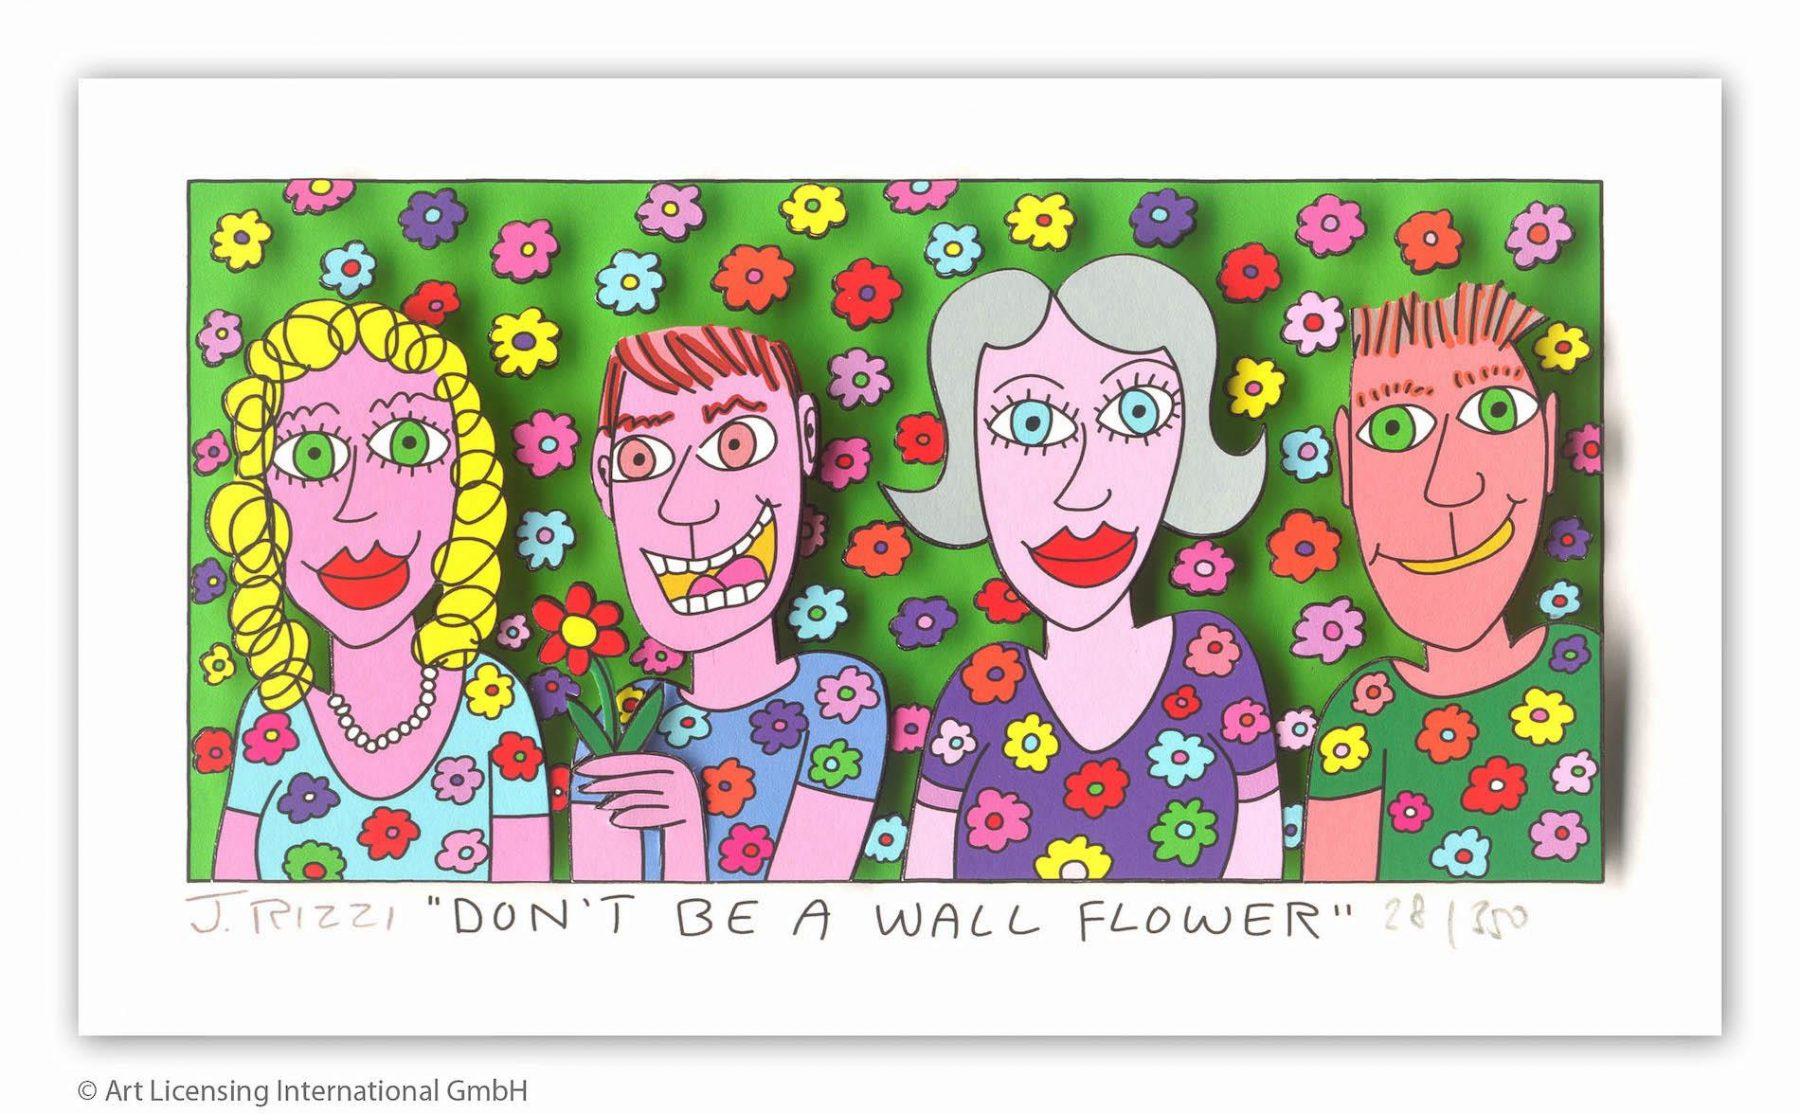 Don't be a wall flower - Rizzi, James - k-2108RIZ3